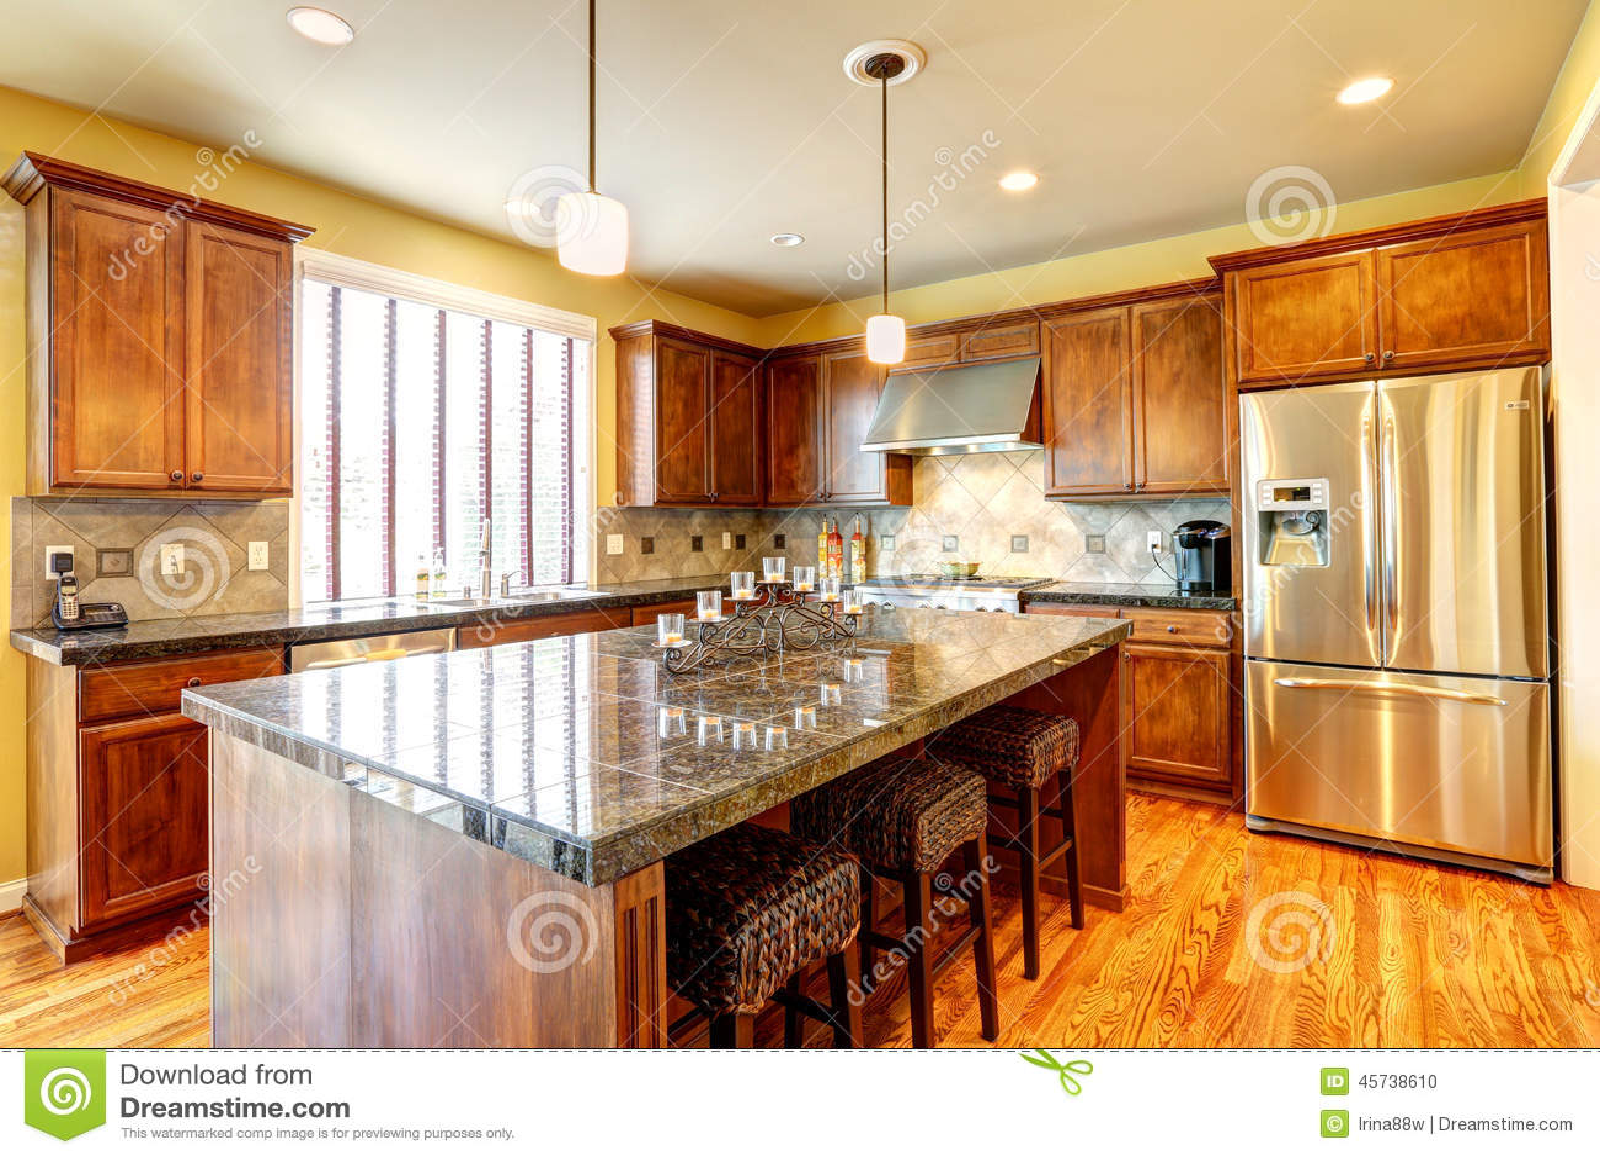 Luxury kitchen room with island stock photo image 45738610 - Luxury kitchen room ...